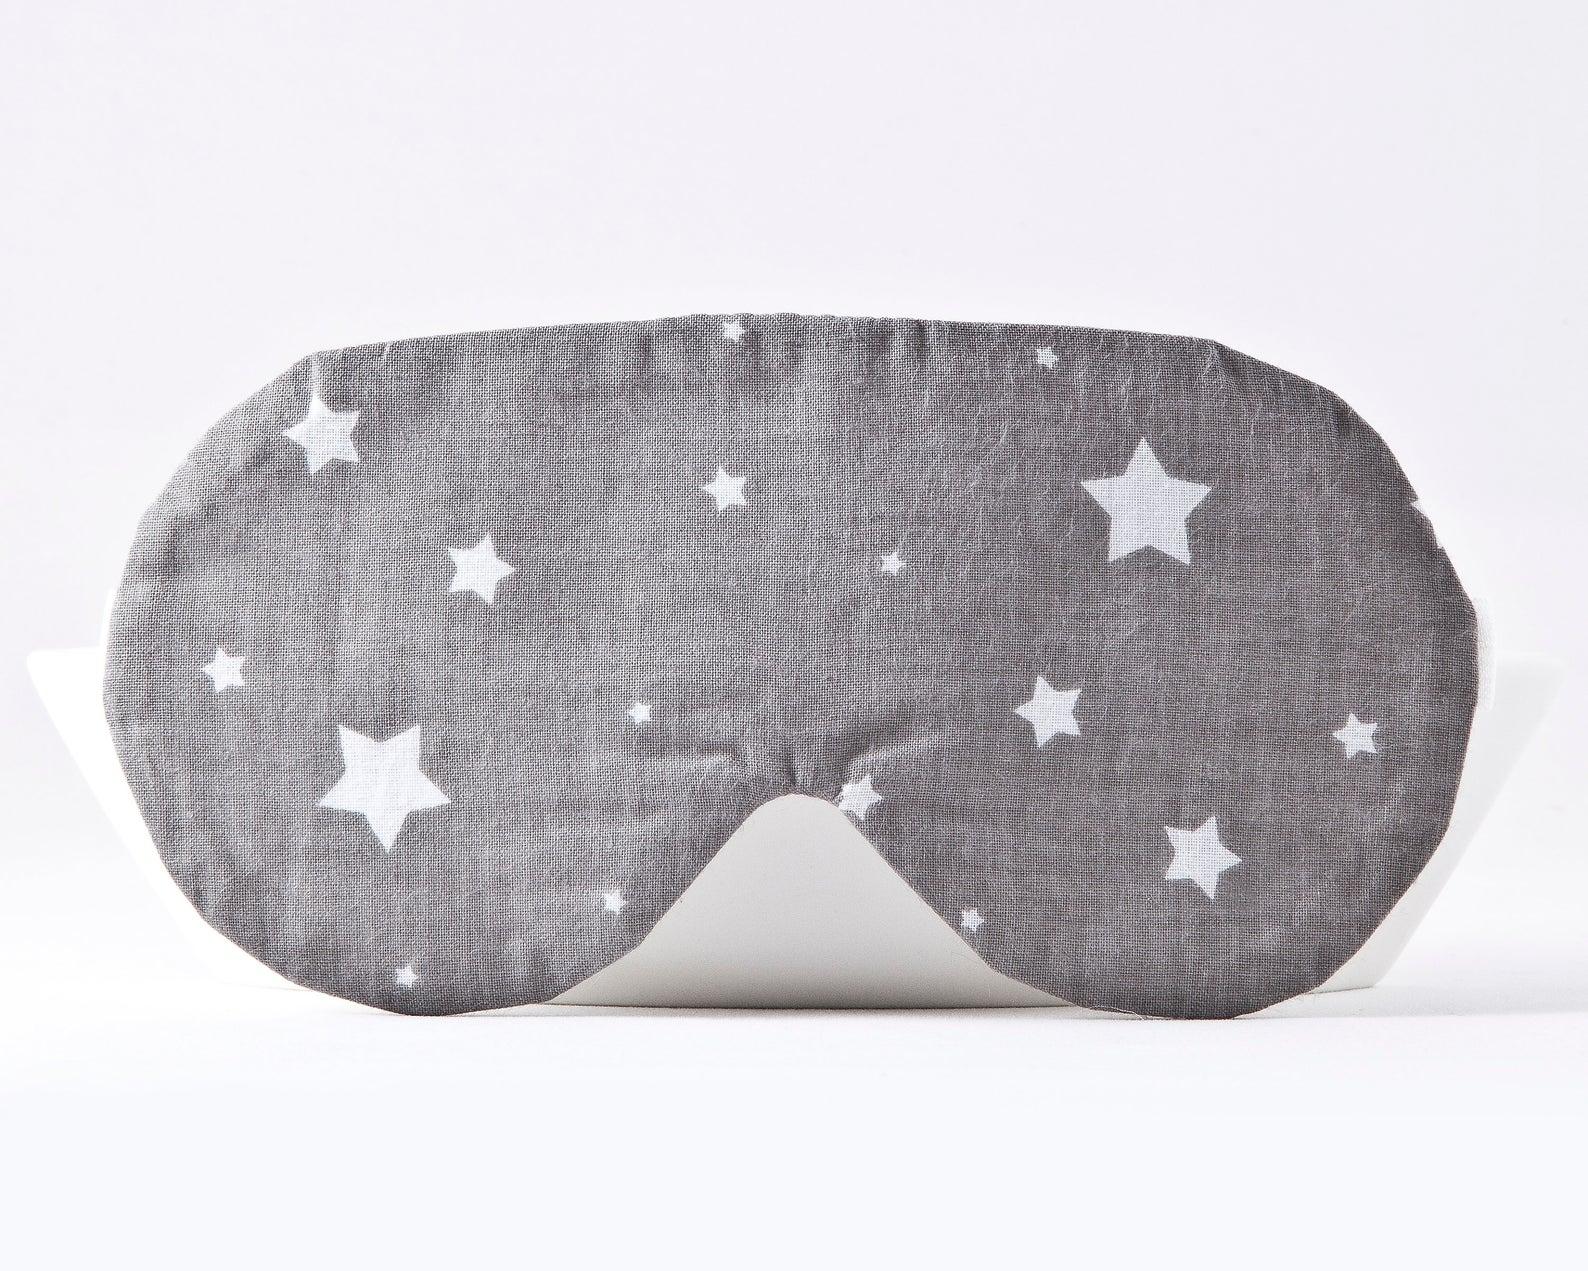 Gray Travel Sleep Mask with Stars by Julia Wine